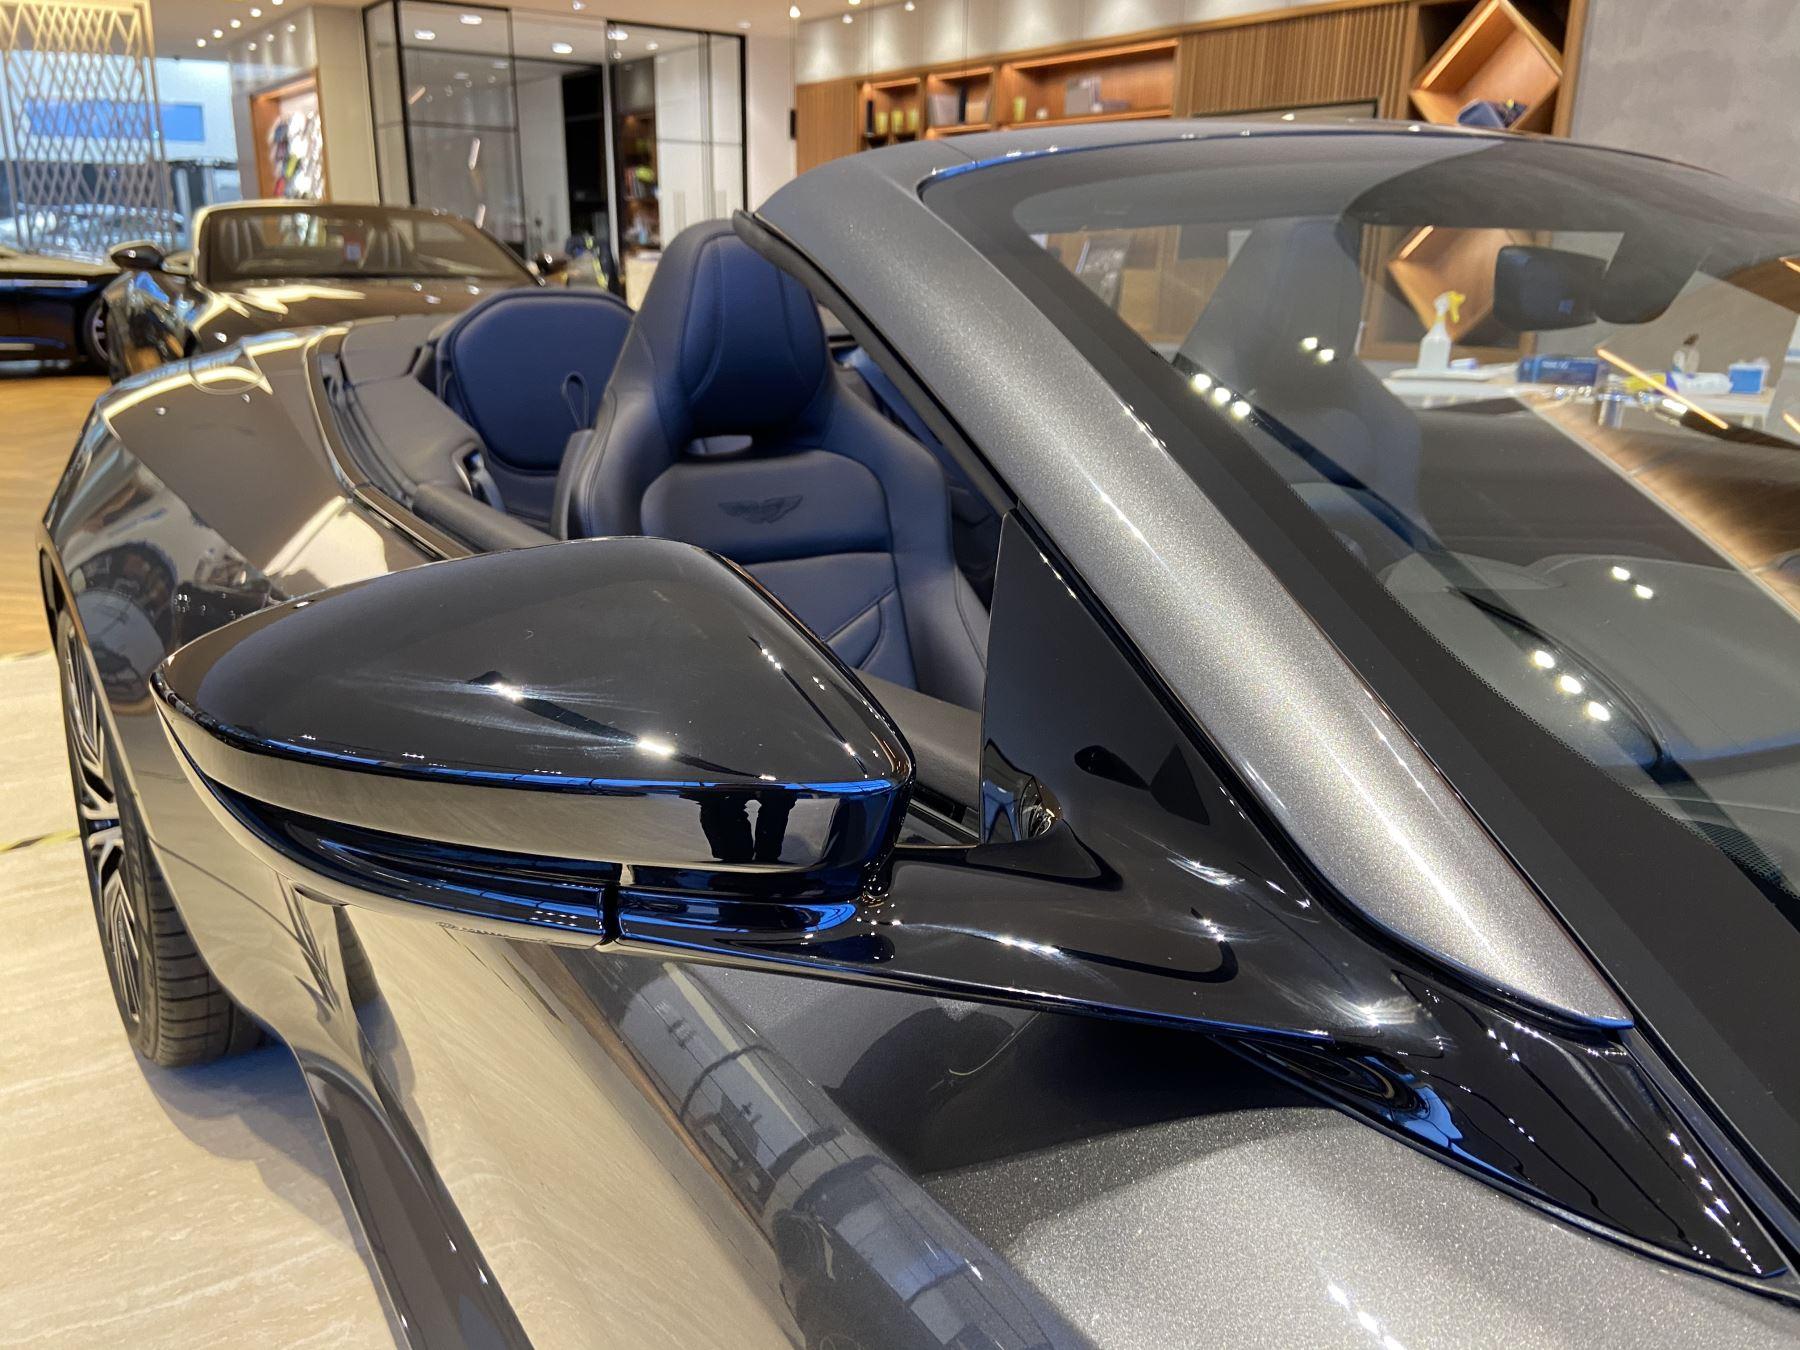 Aston Martin DBS V12 Superleggera Volante Touchtronic image 23